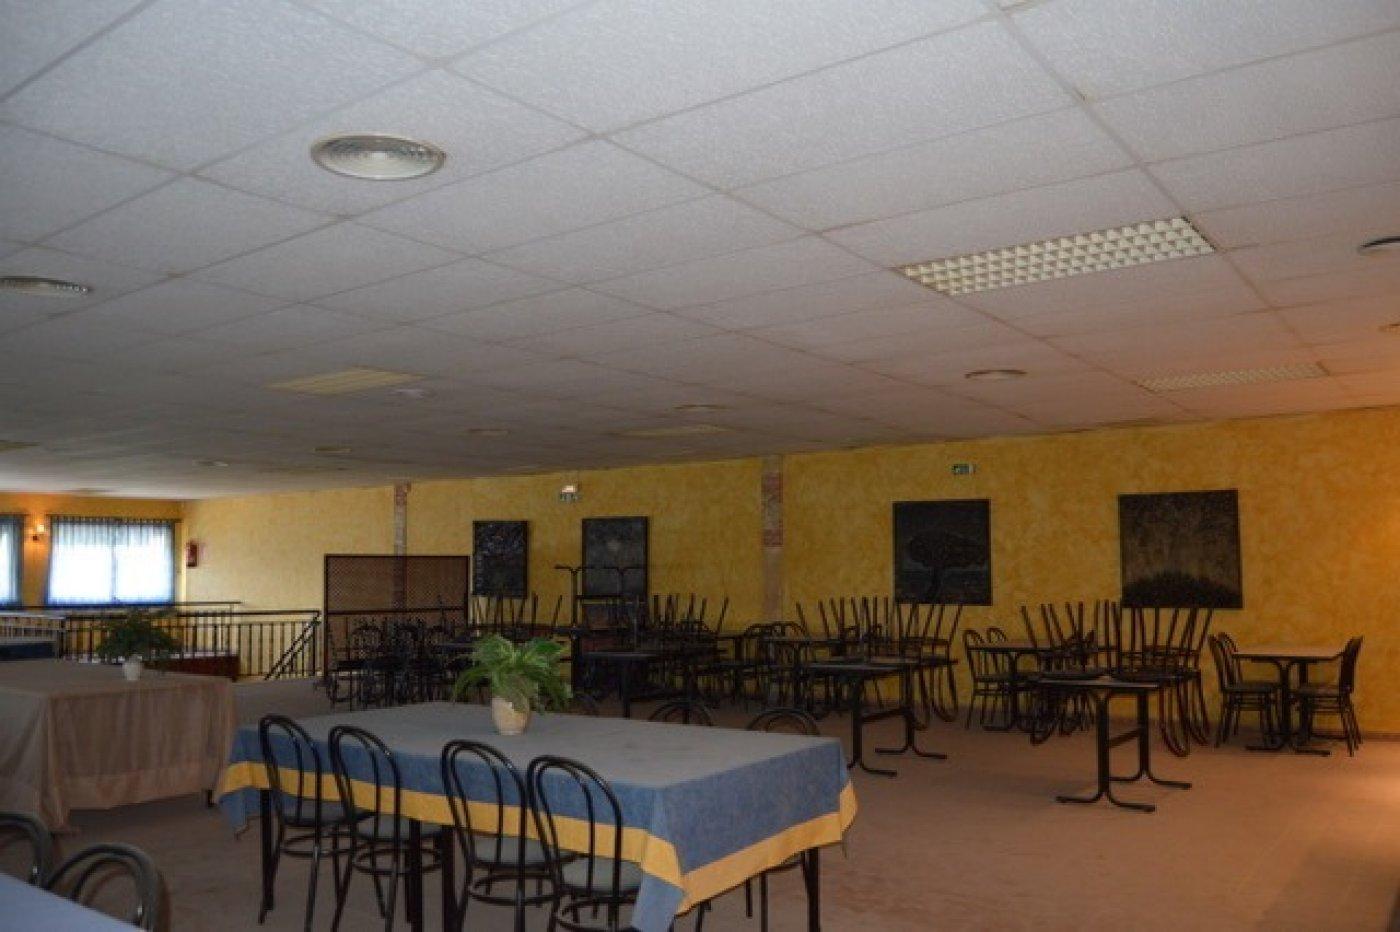 Nave restaurante en polígono cerca de sant sadurní d´anoia - imagenInmueble20